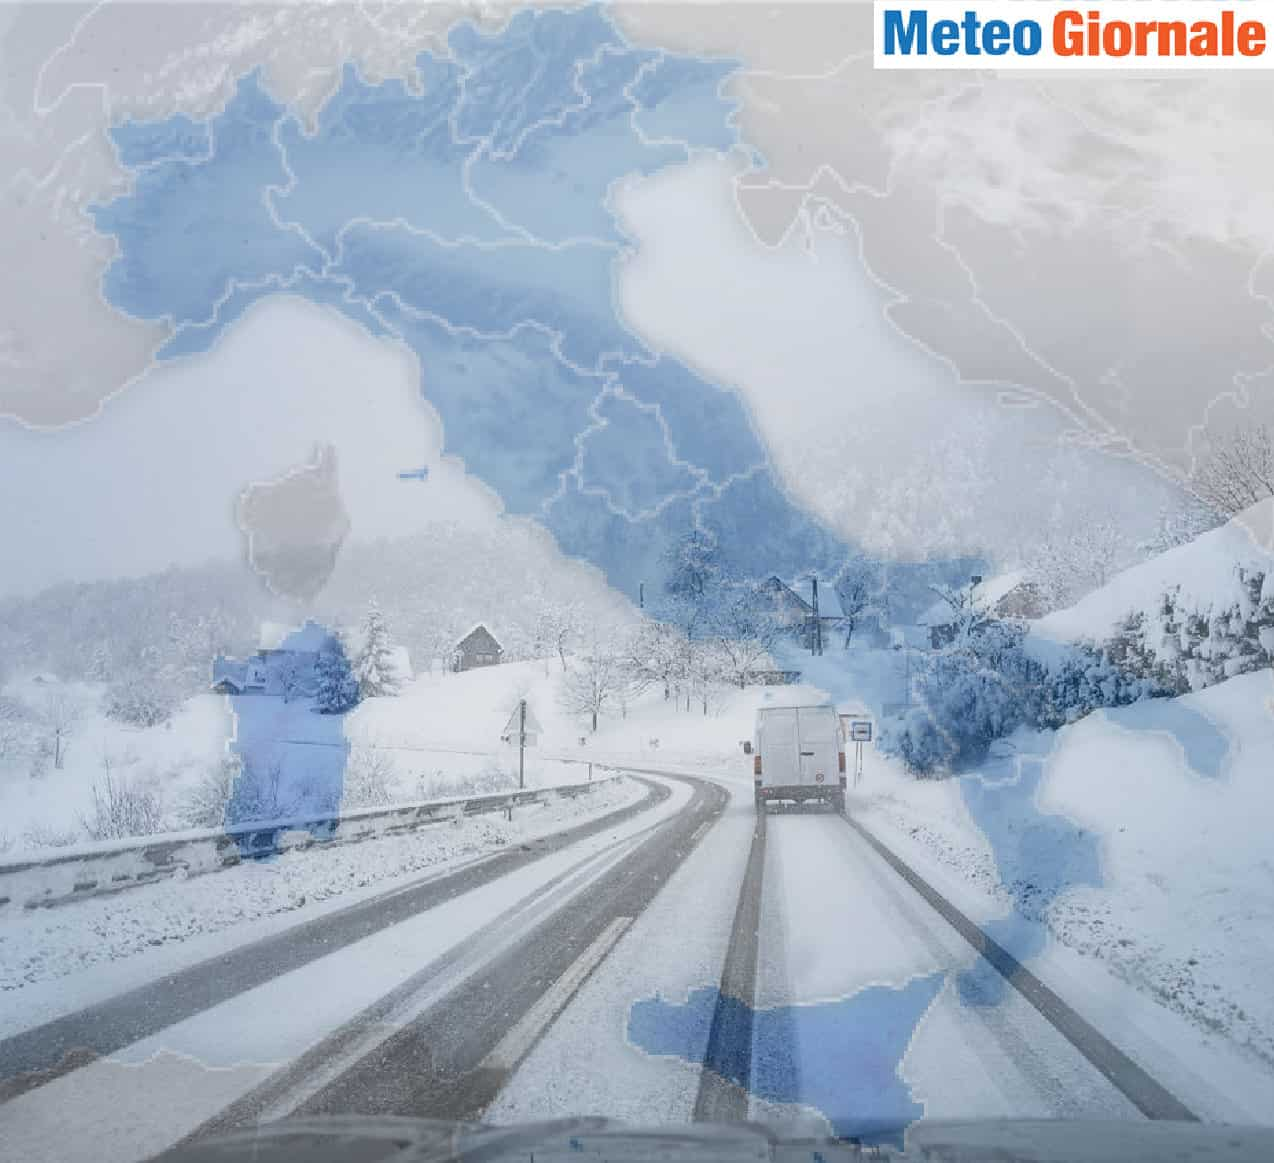 neve italia - INVERNO 2021/2022 imbestialito: ipotesi meteo a confronto